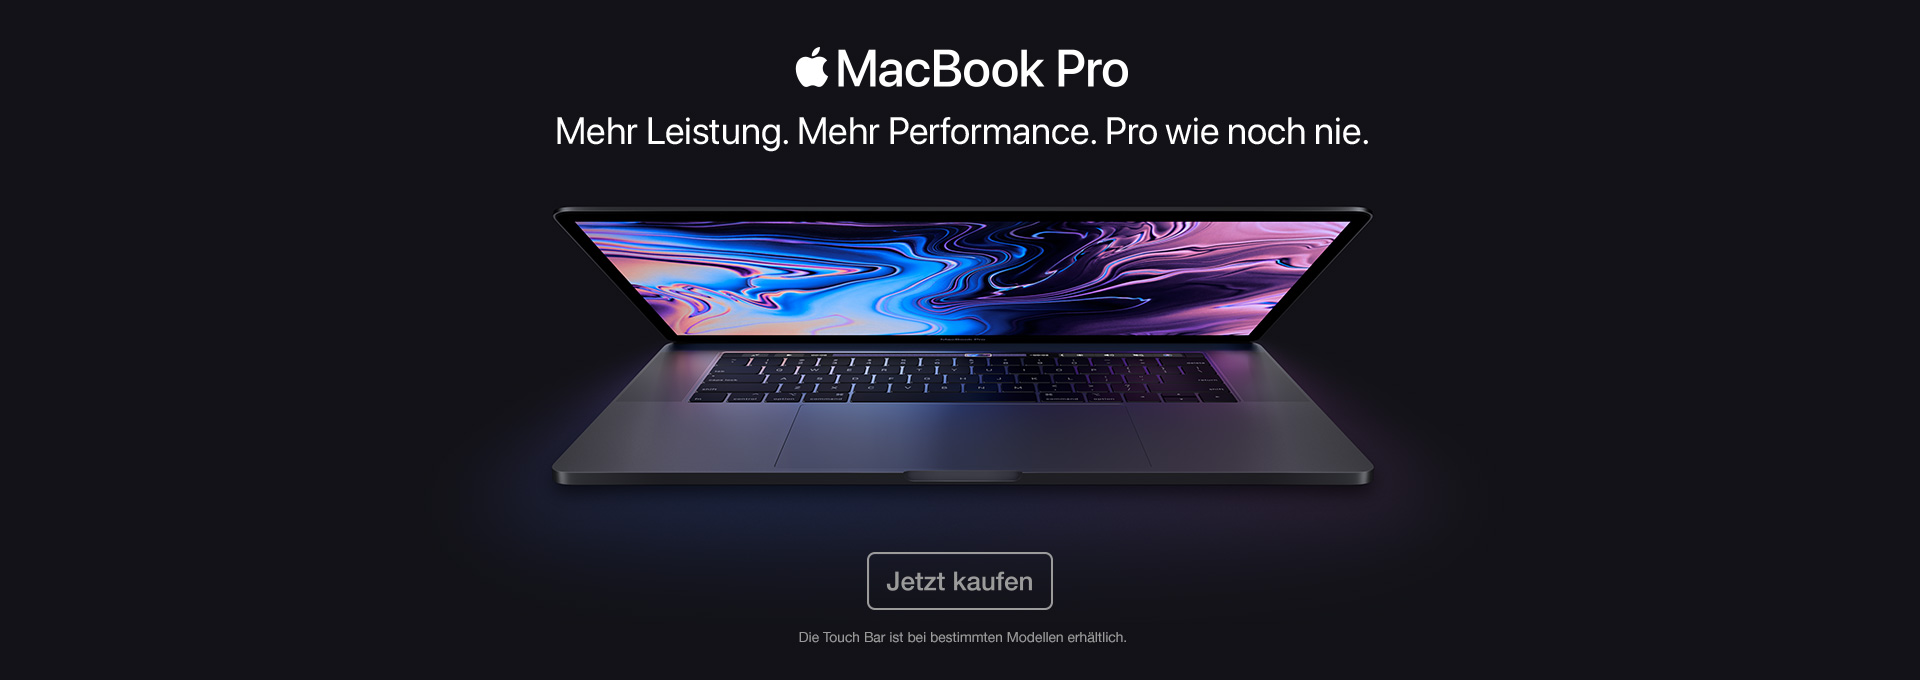 macbook pro 13 touch bar 2018 macbook pro apple. Black Bedroom Furniture Sets. Home Design Ideas